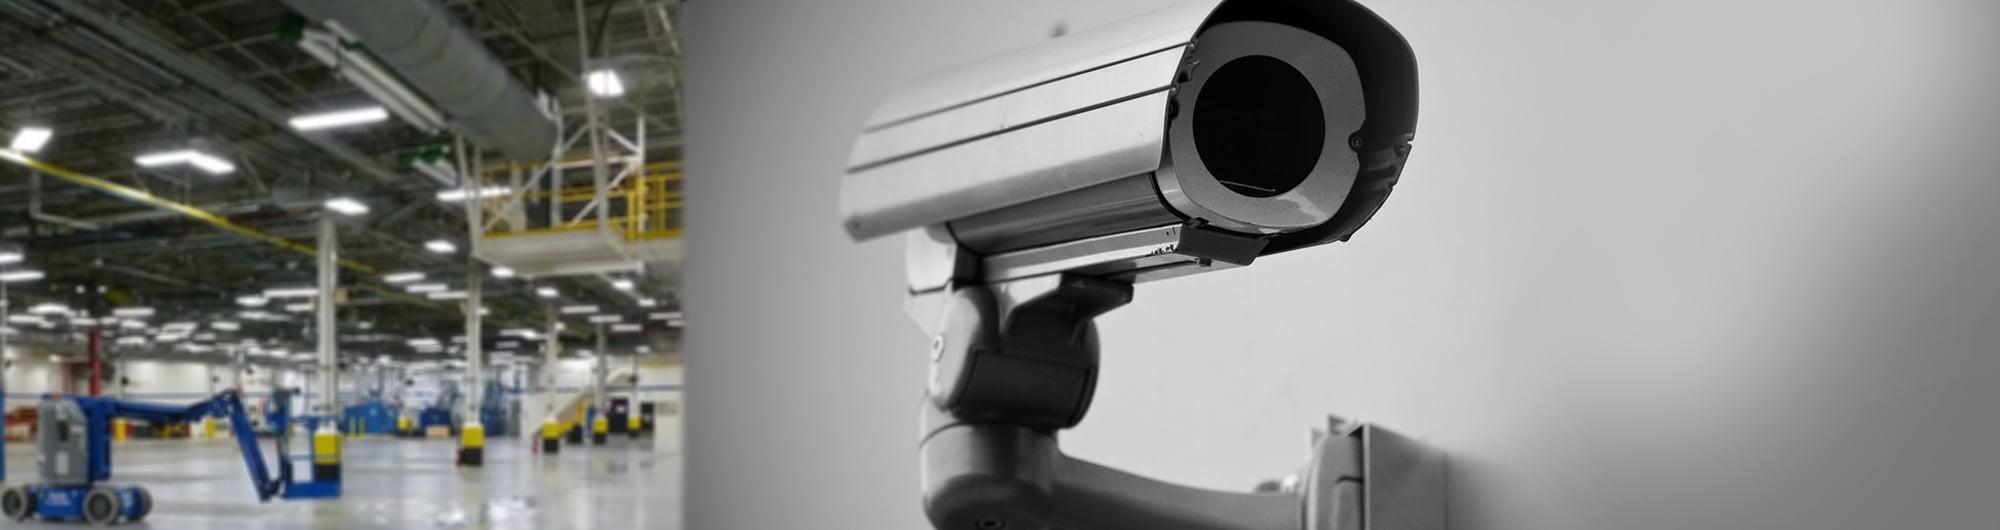 BBG security camera Scarborough